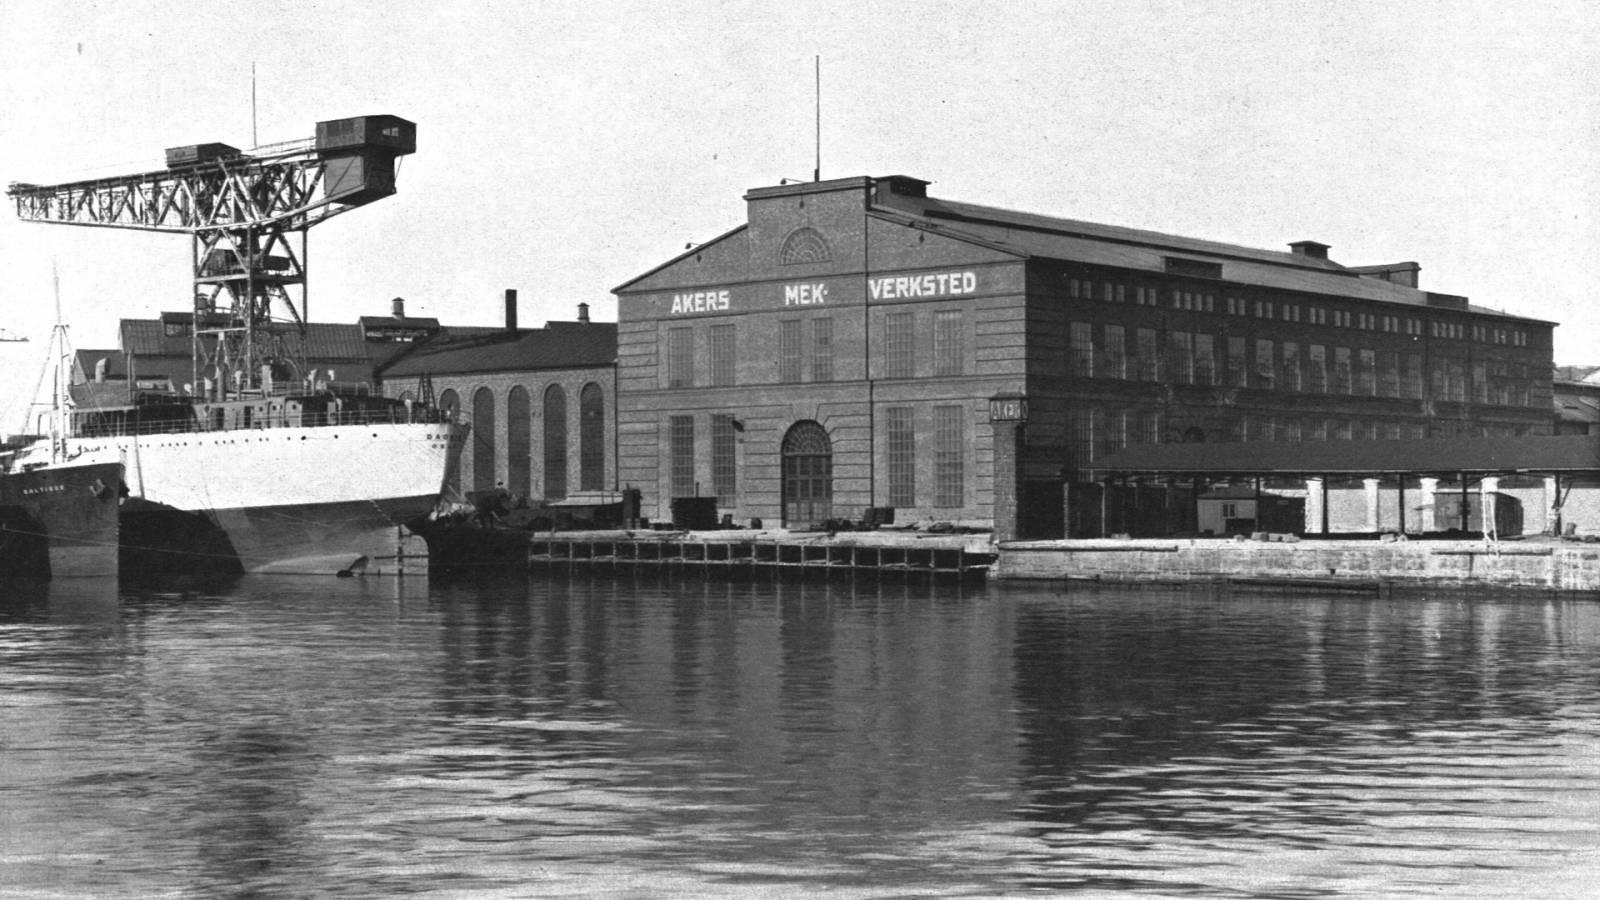 1931 - Akers Mek Verksted - SPOL Architects